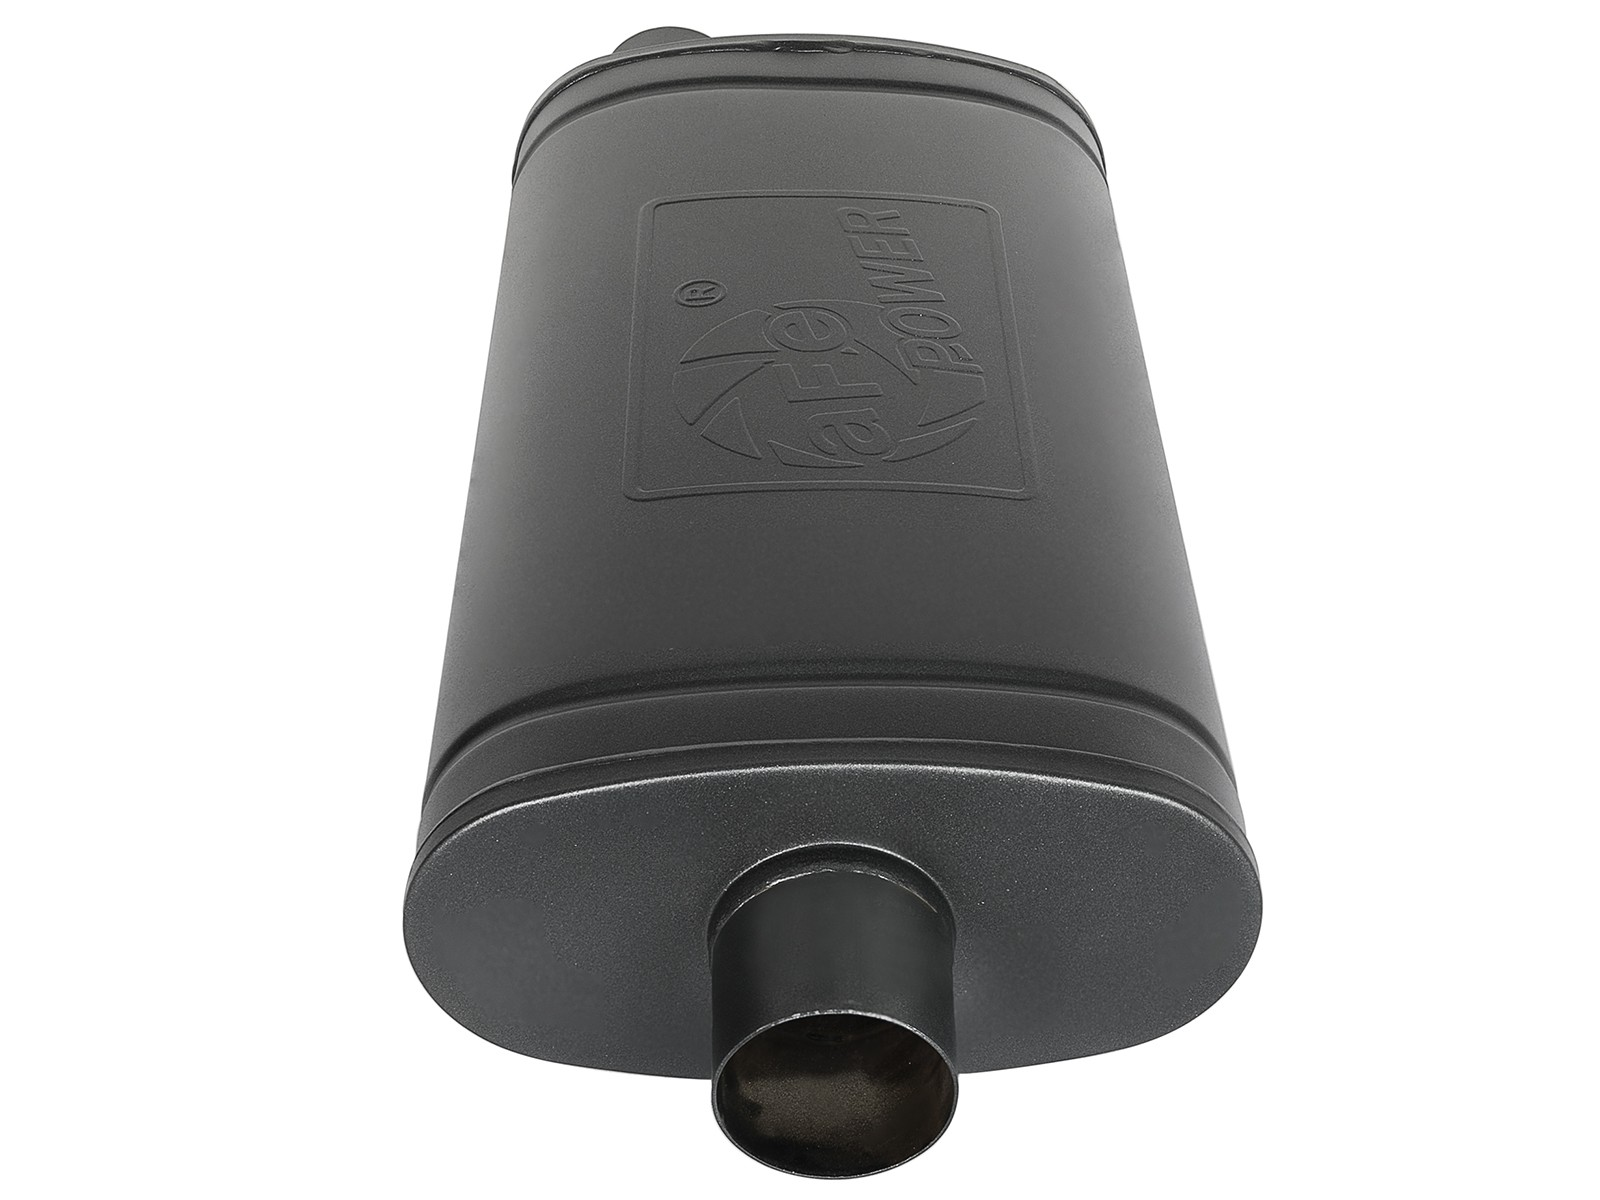 aFe Power MACH Force-Xp 49M00016 3 to 3 Muffler